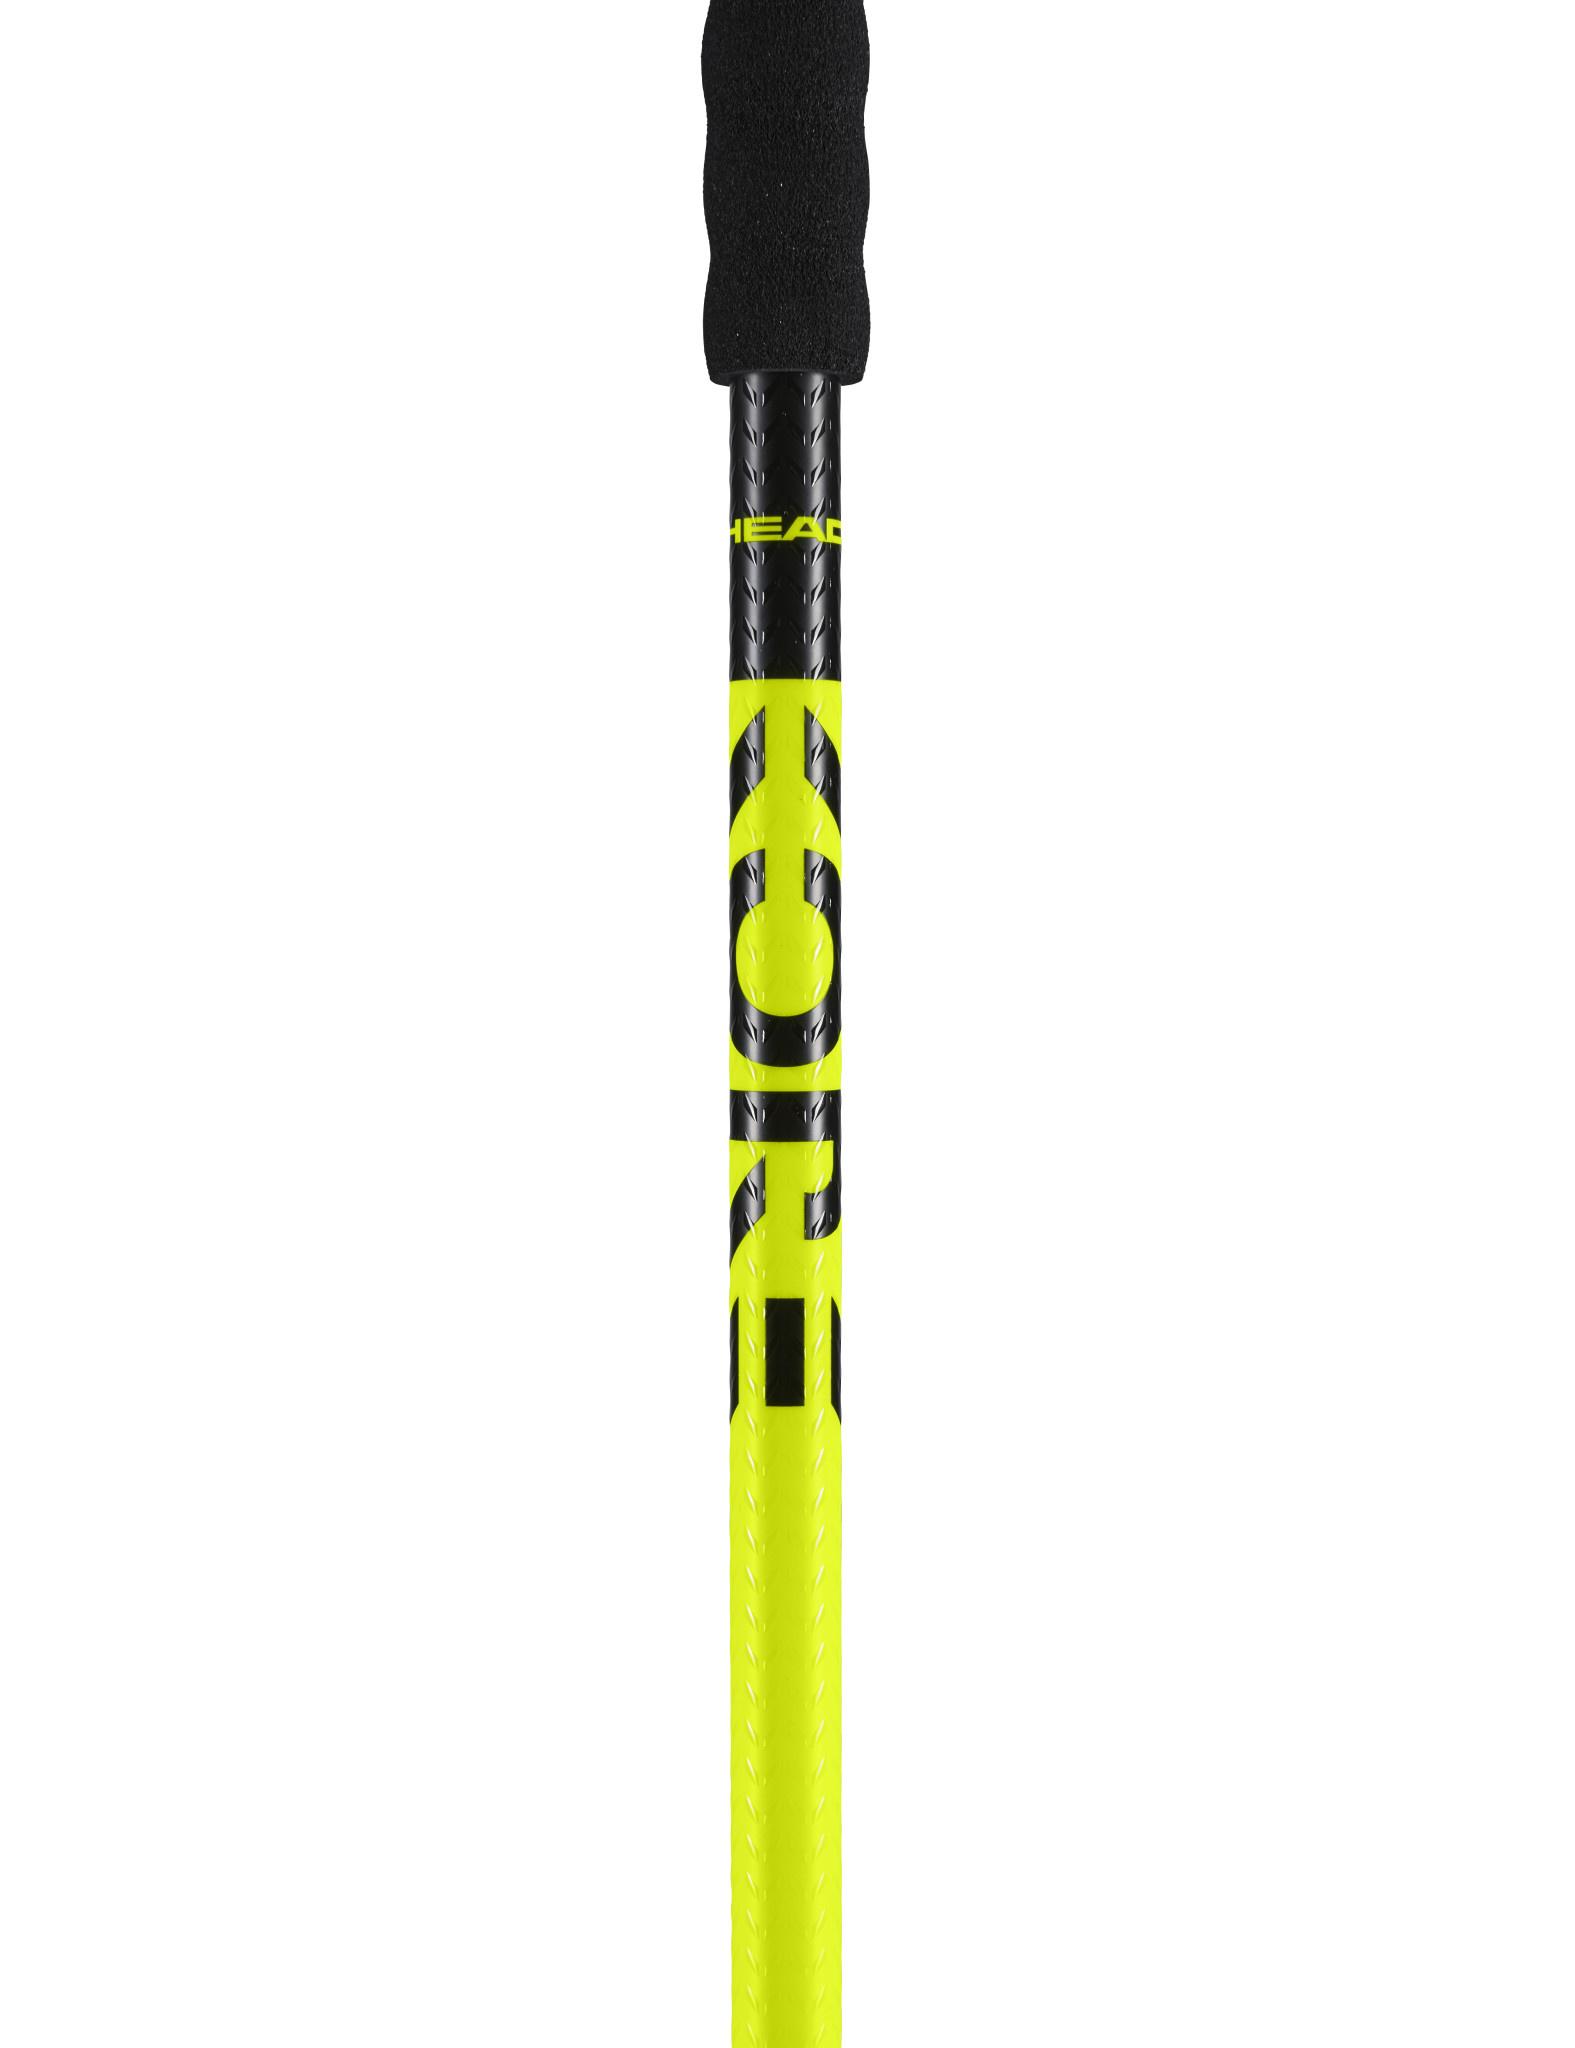 Head Head Kore Ski Pole (2021)